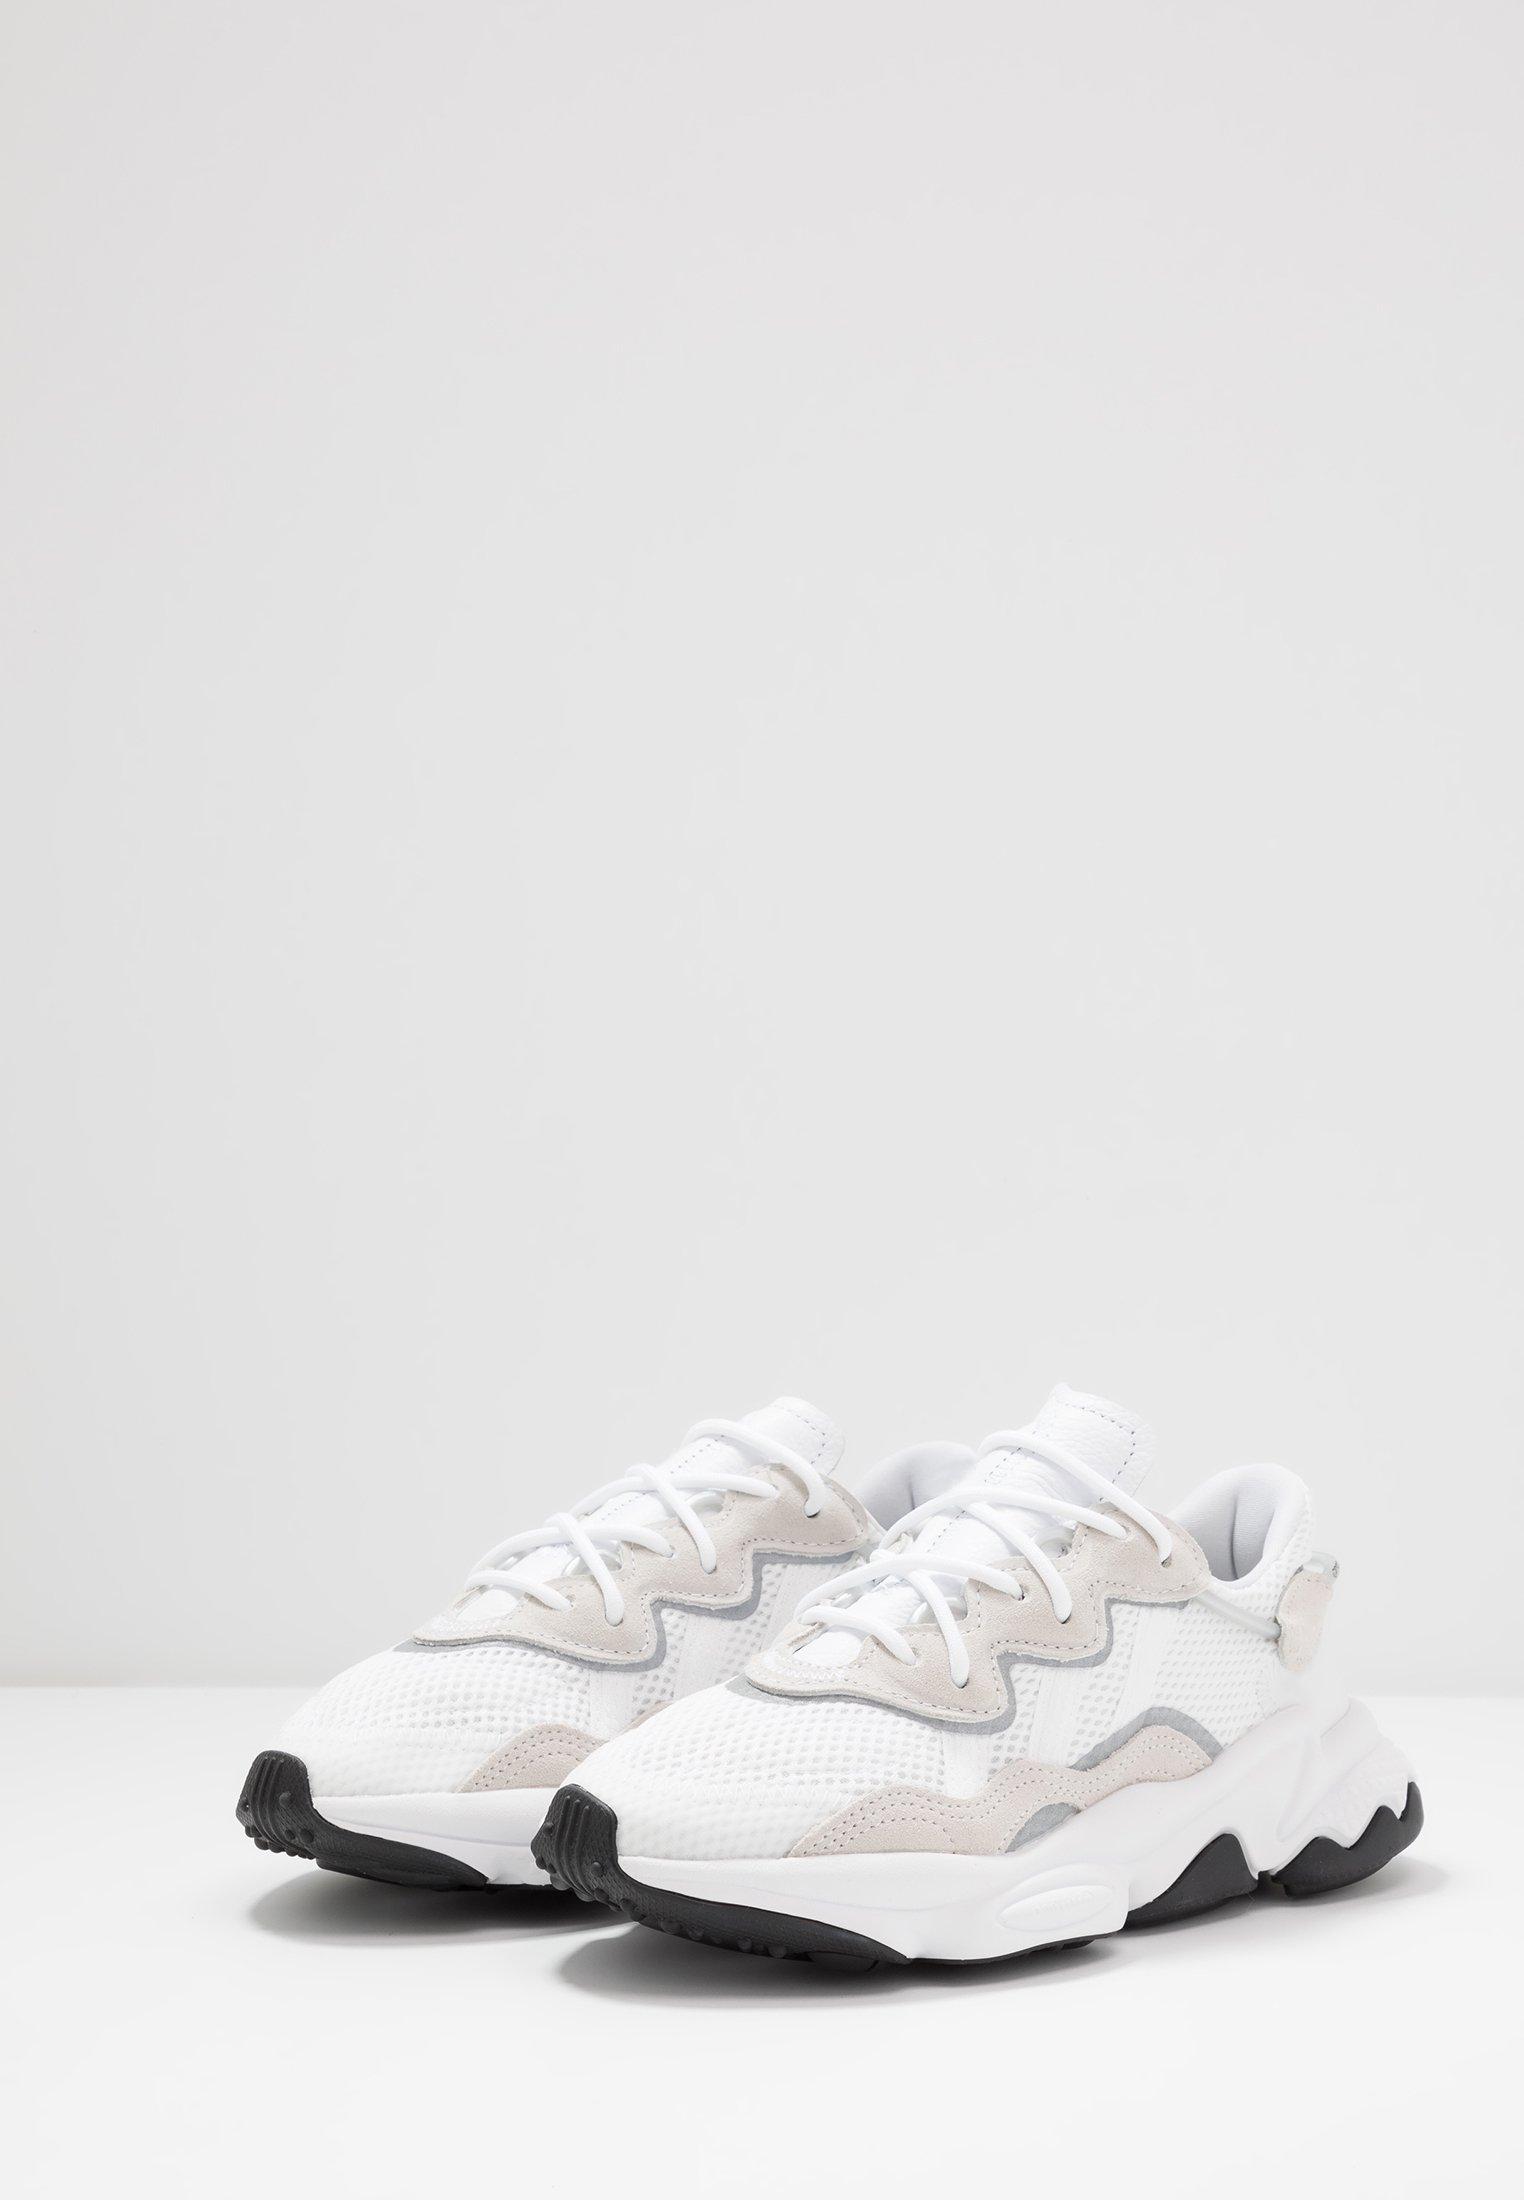 core Basses Black Adidas Originals OzweegoBaskets Footwear White FlK13uTc5J